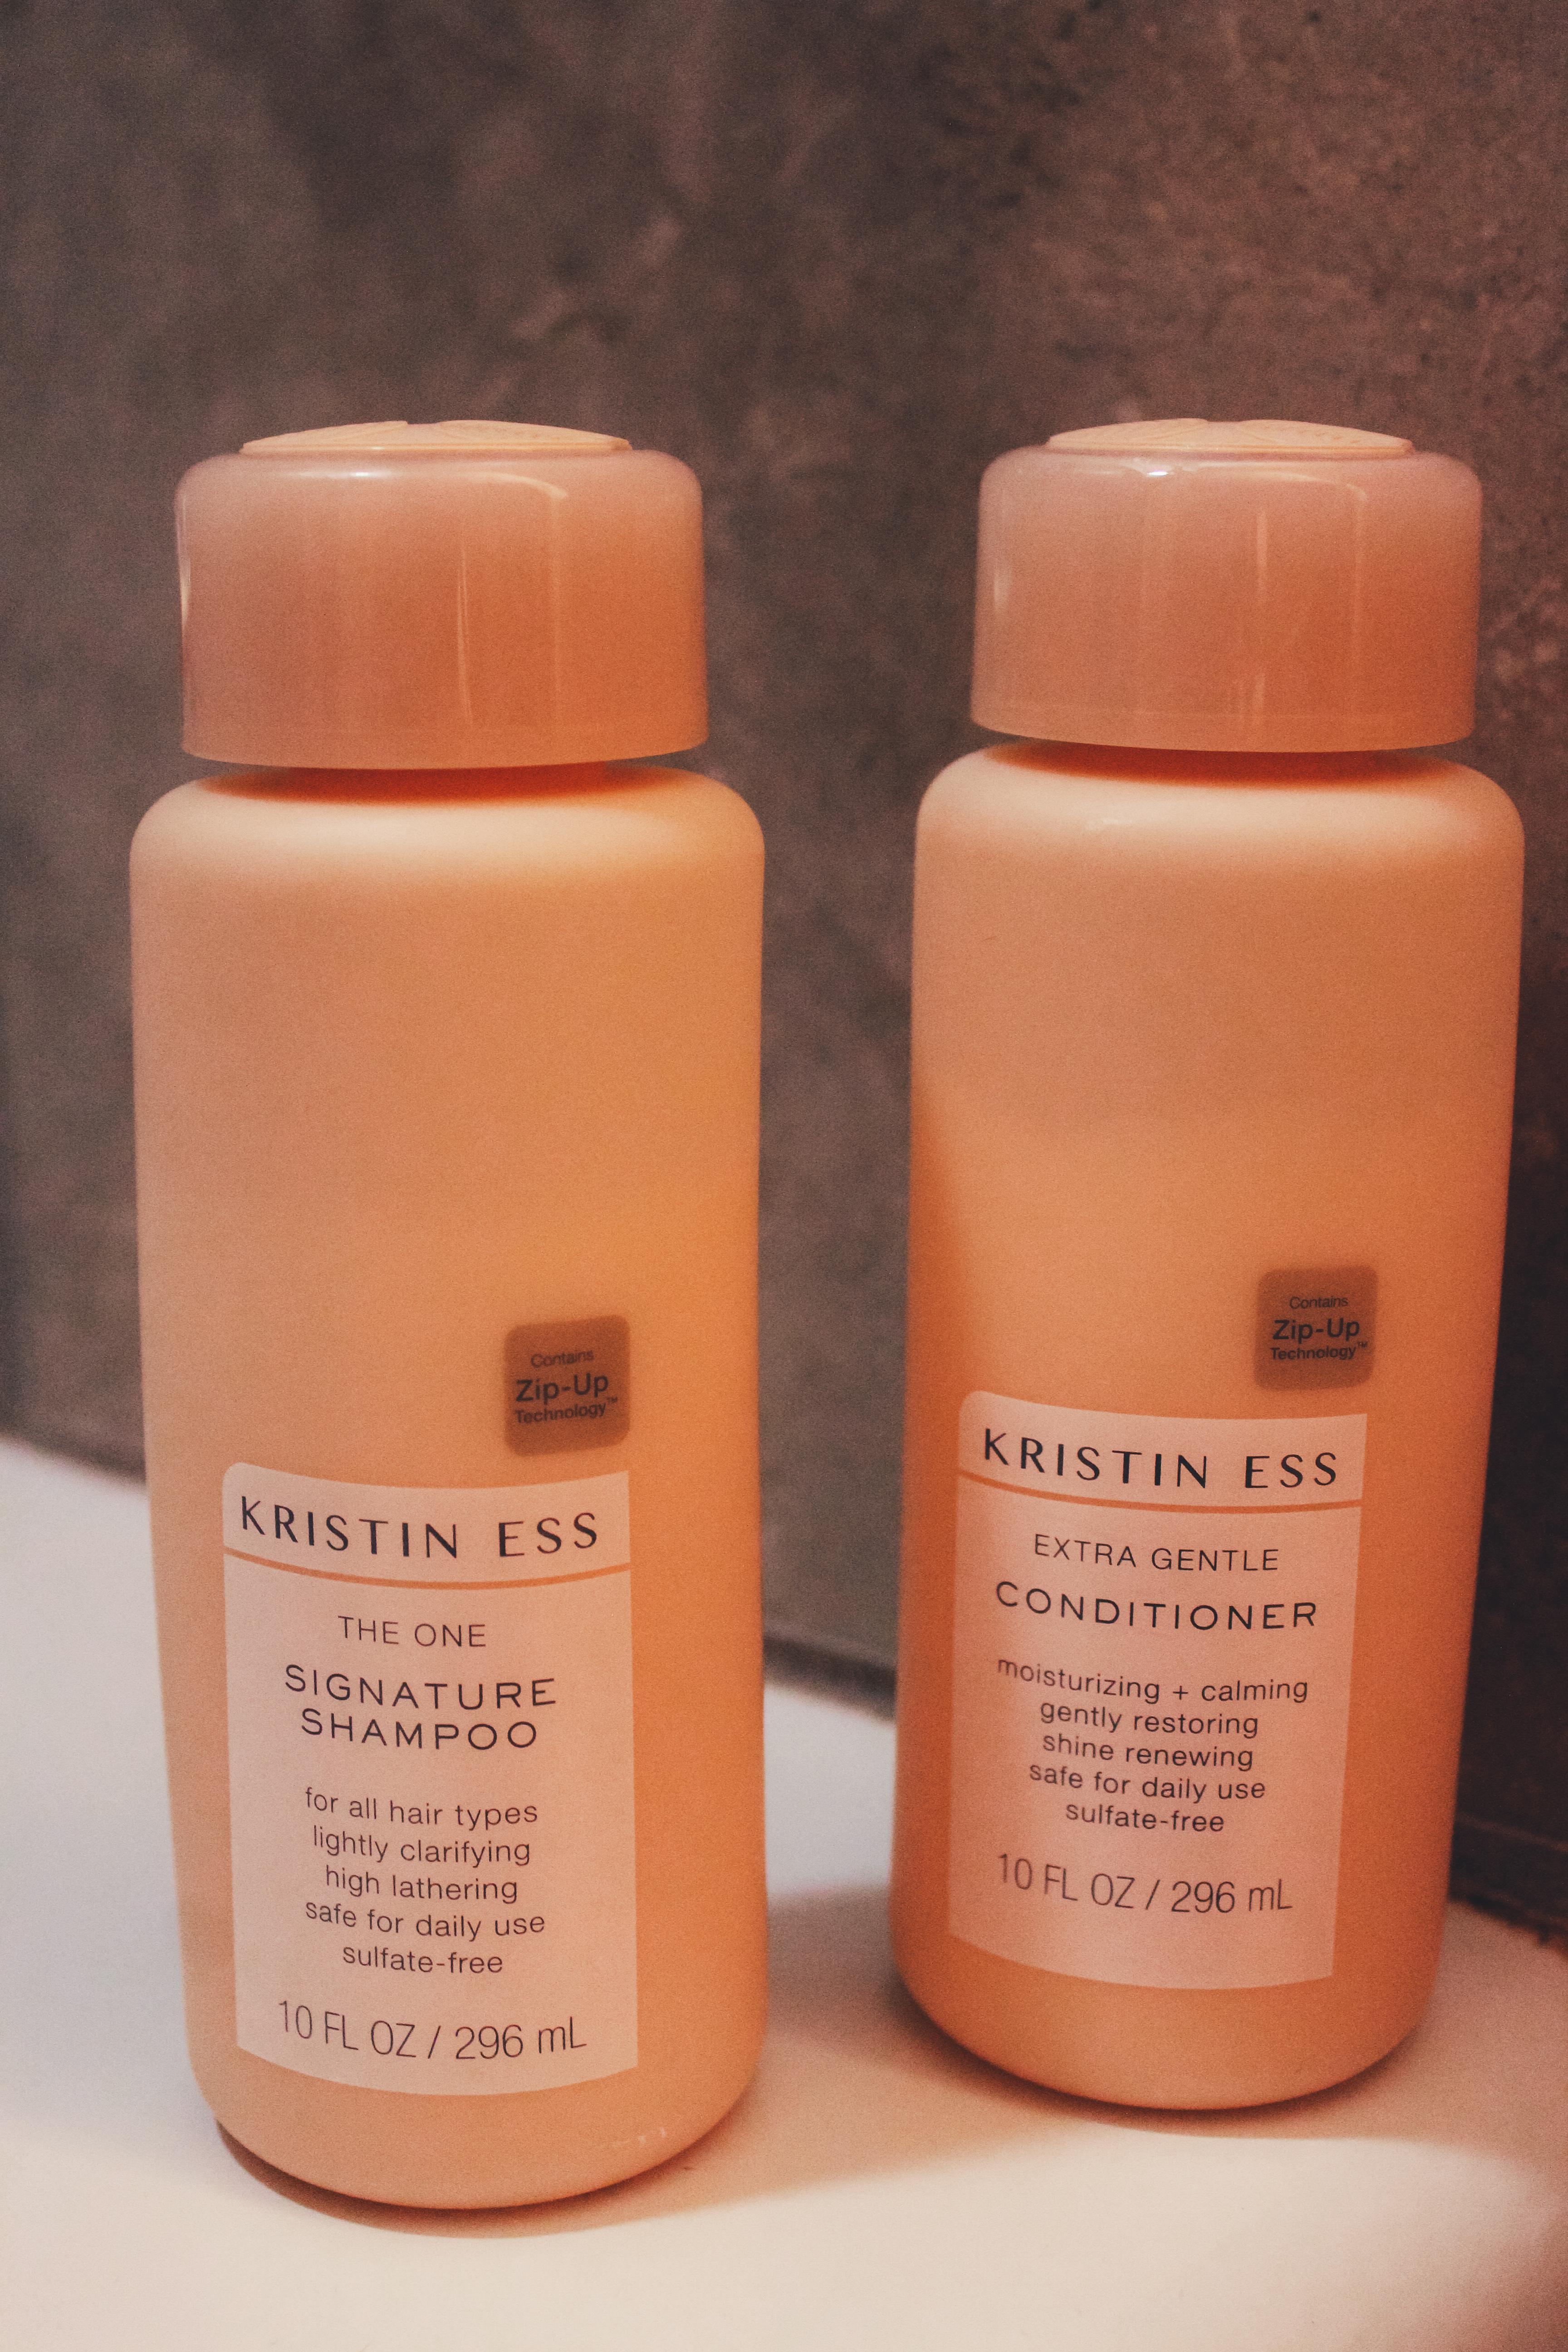 Kristin Ess Shampoo and Conditioner